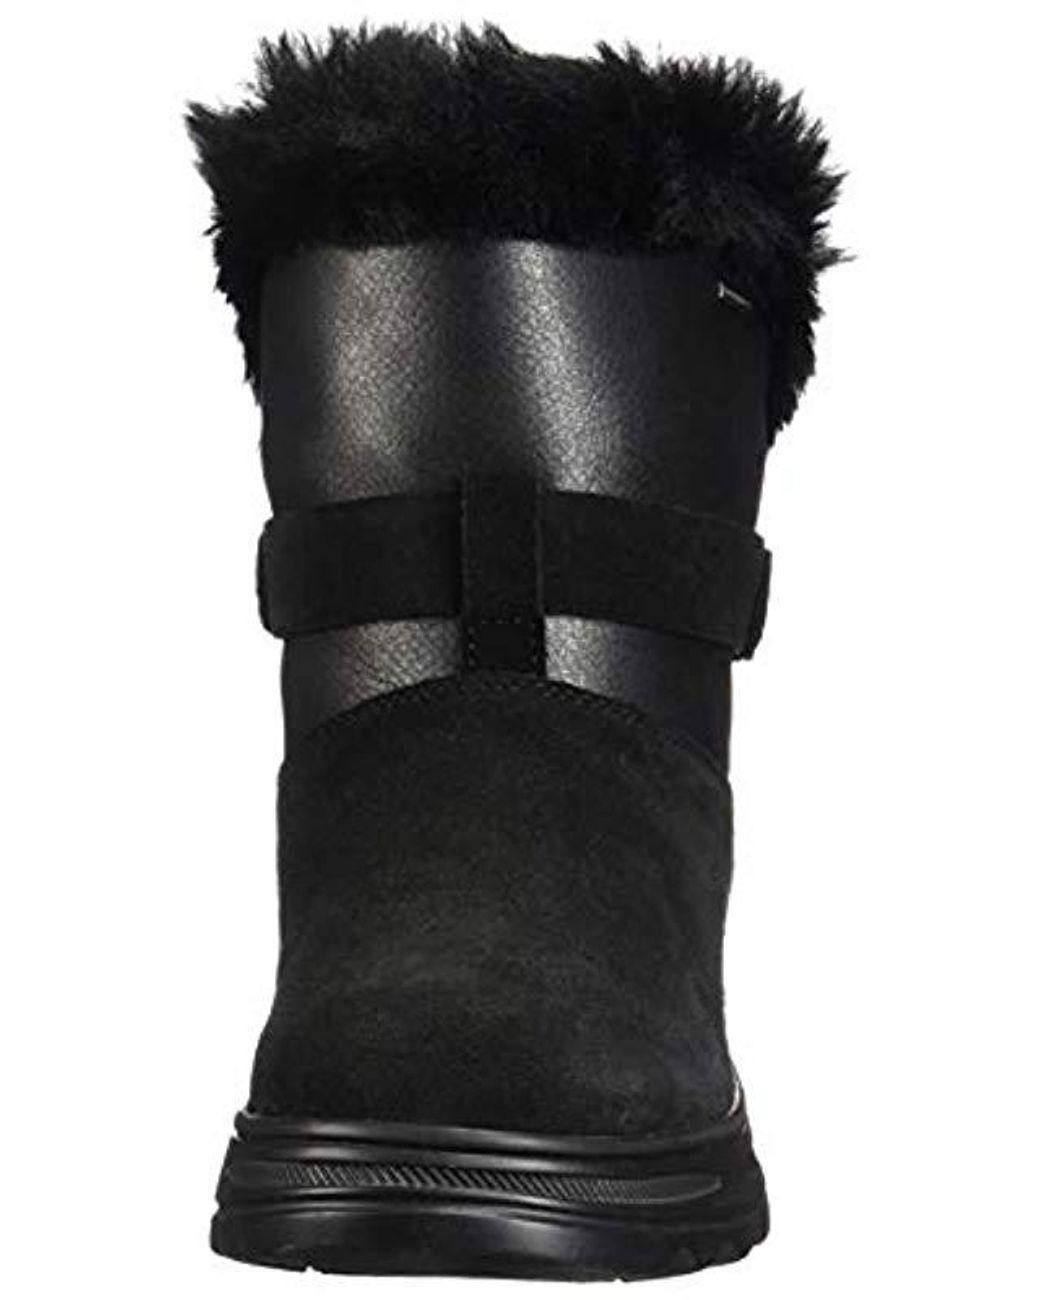 b7fdb08c5c0 Geox D Hosmos B Abx C Snow Boots in Black - Lyst